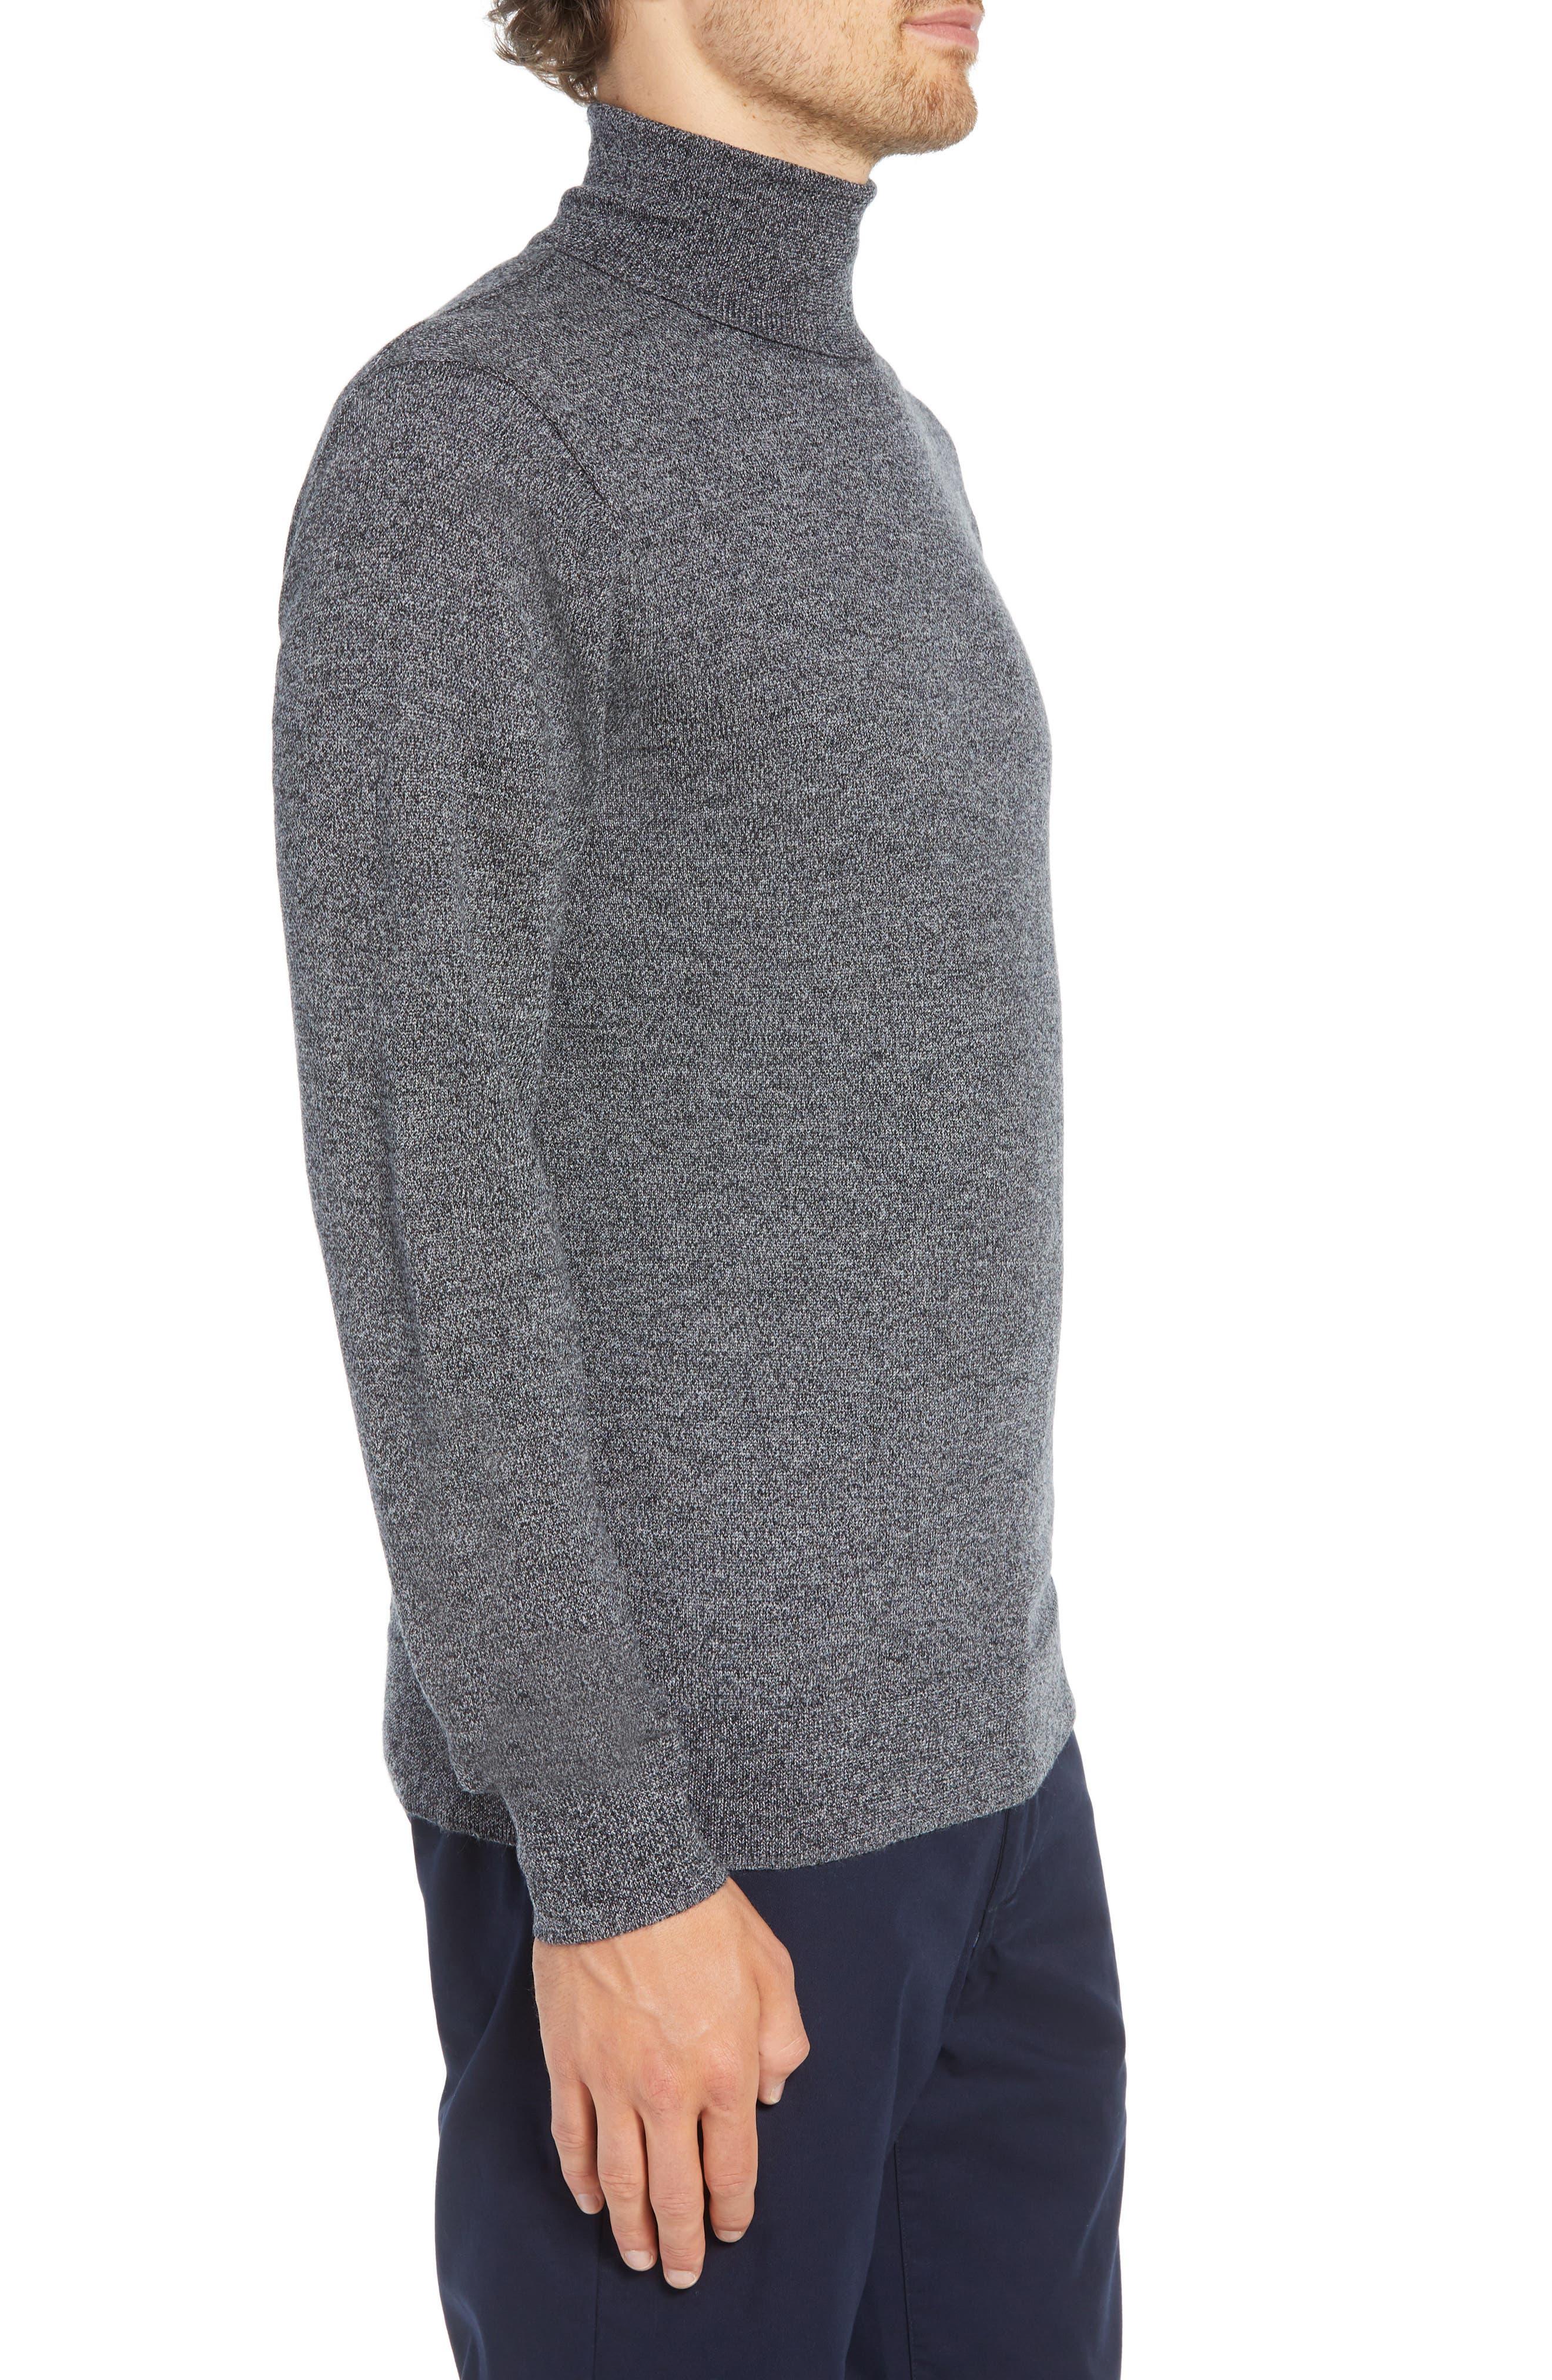 Slim Fit Turtleneck Merino Wool Sweater,                             Alternate thumbnail 3, color,                             CHARCOAL MARL